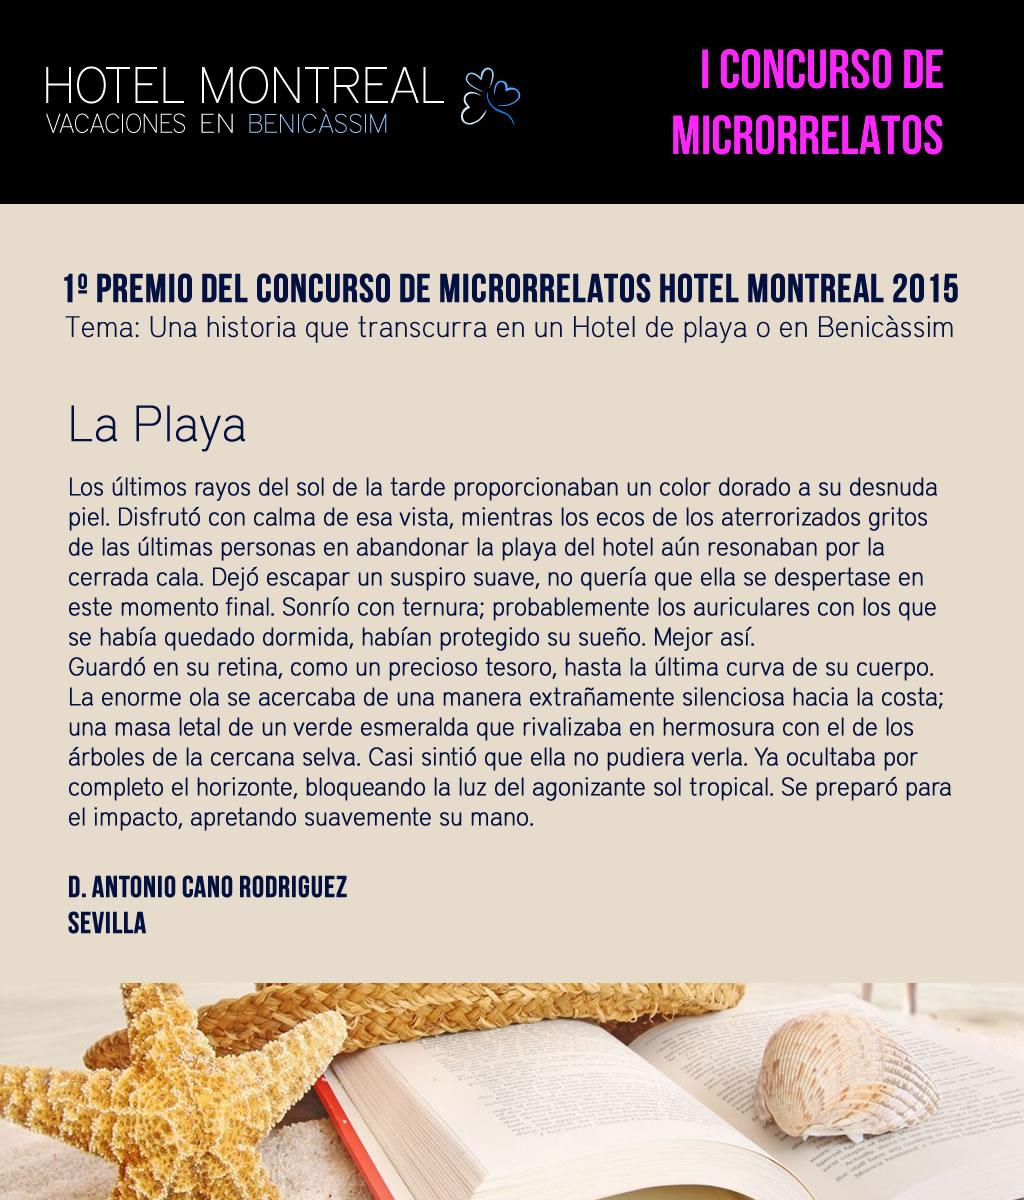 3 Premio microrrelatos 2015